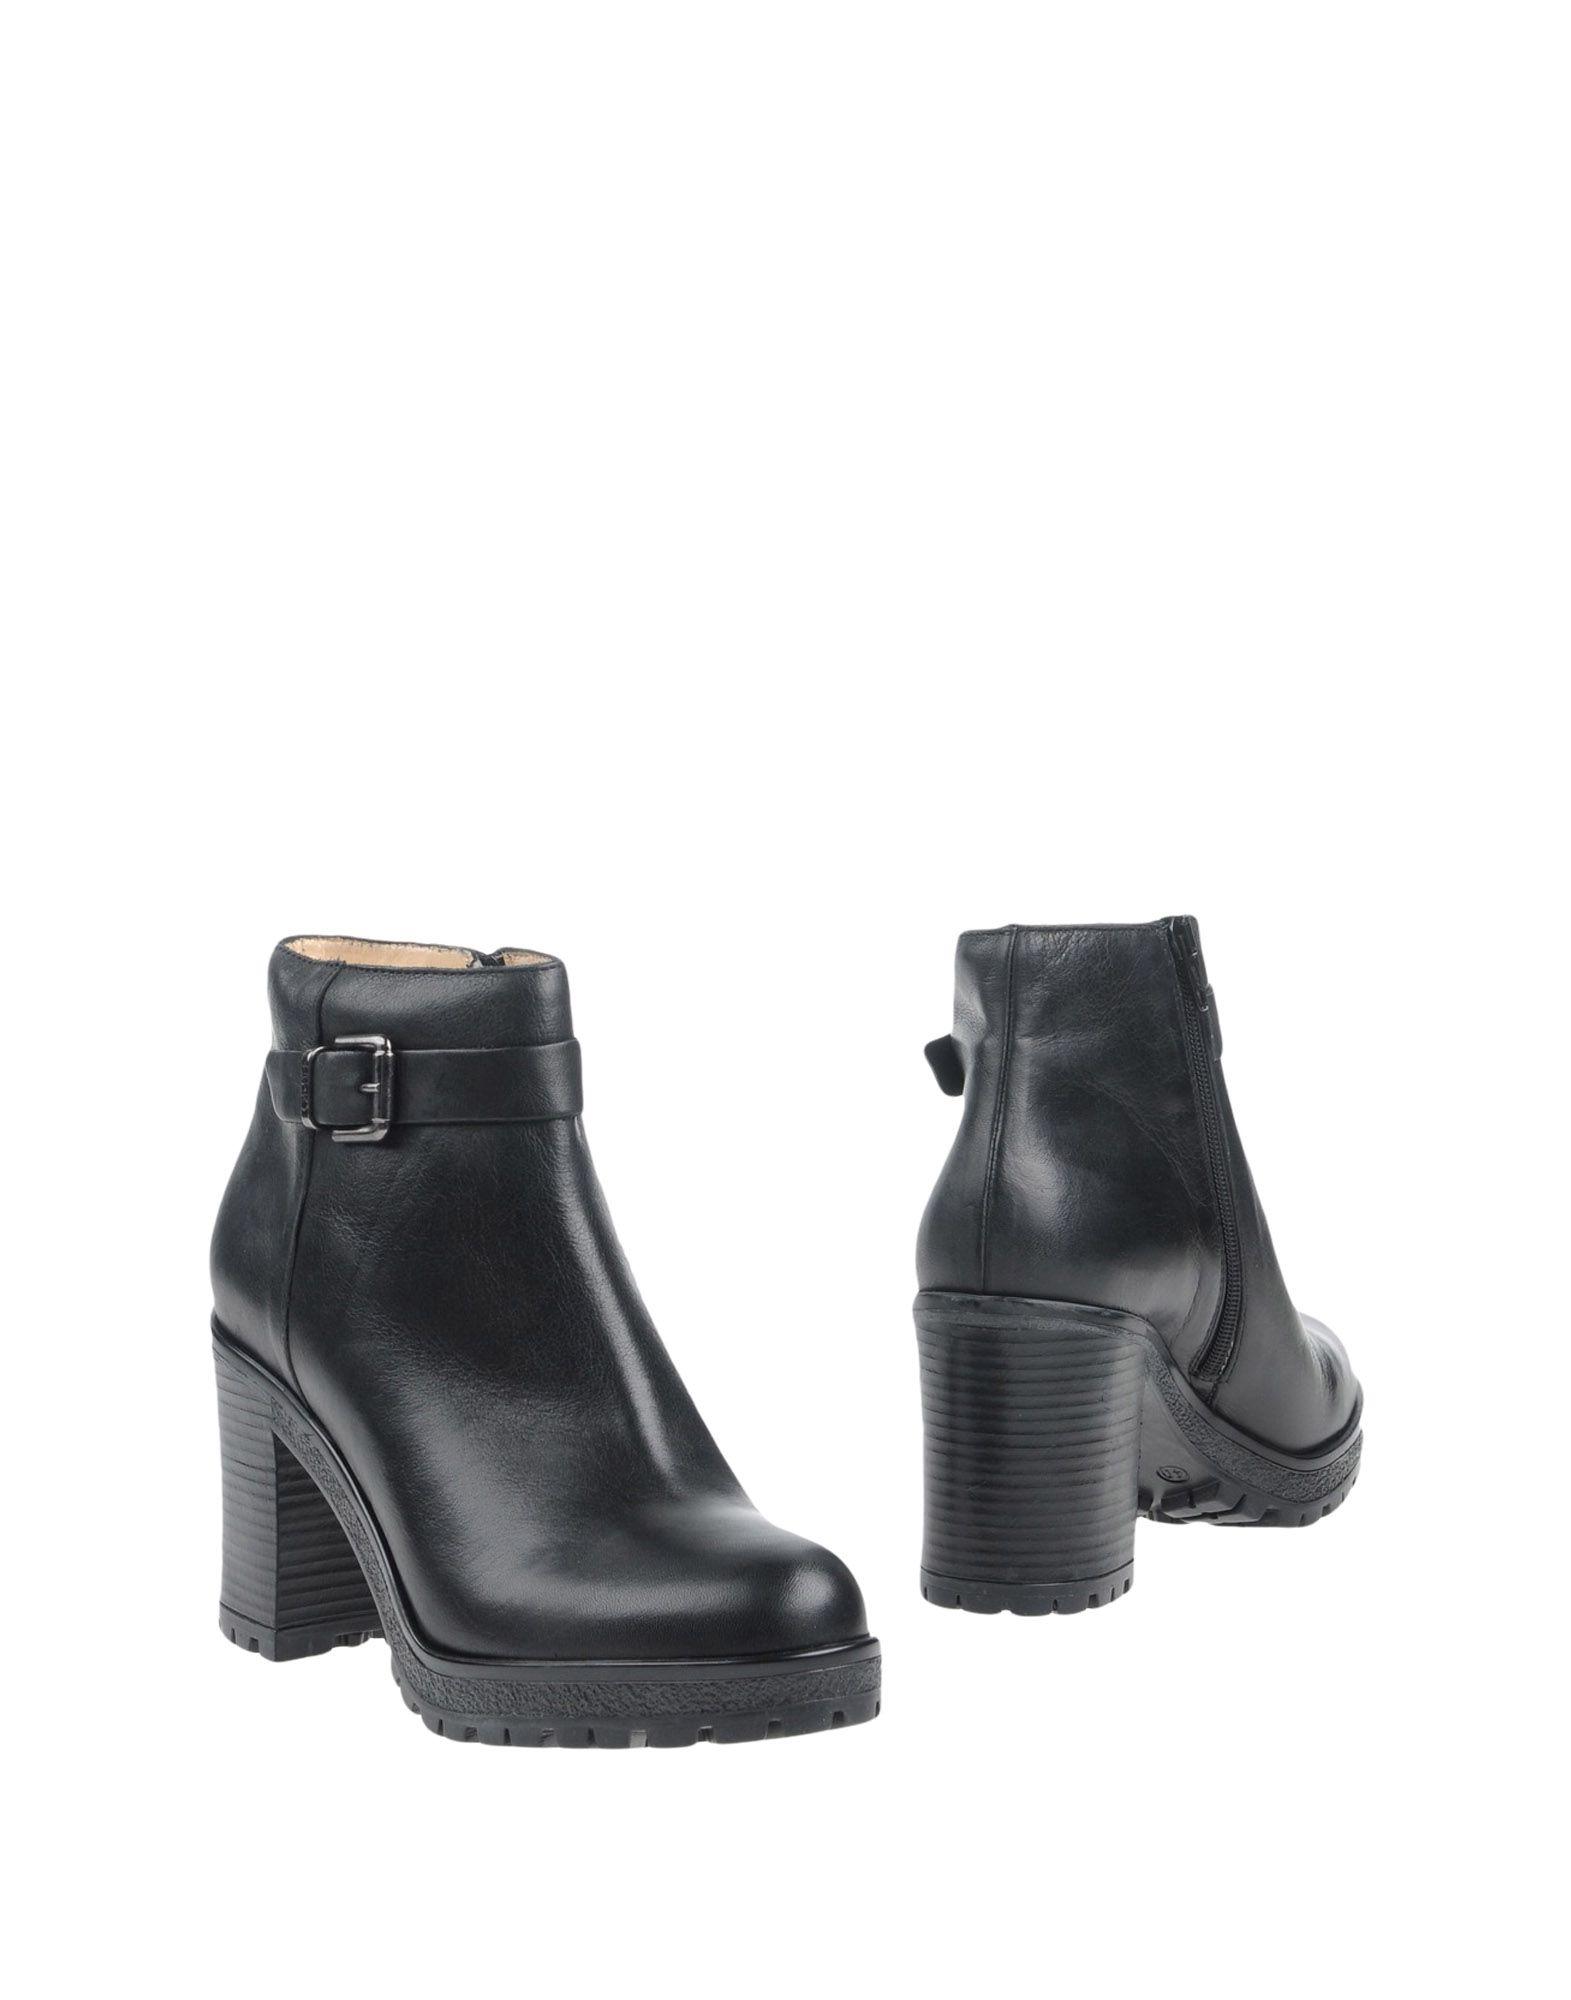 Bottine Liu •Jo Shoes Femme - Bottines Liu •Jo Shoes sur